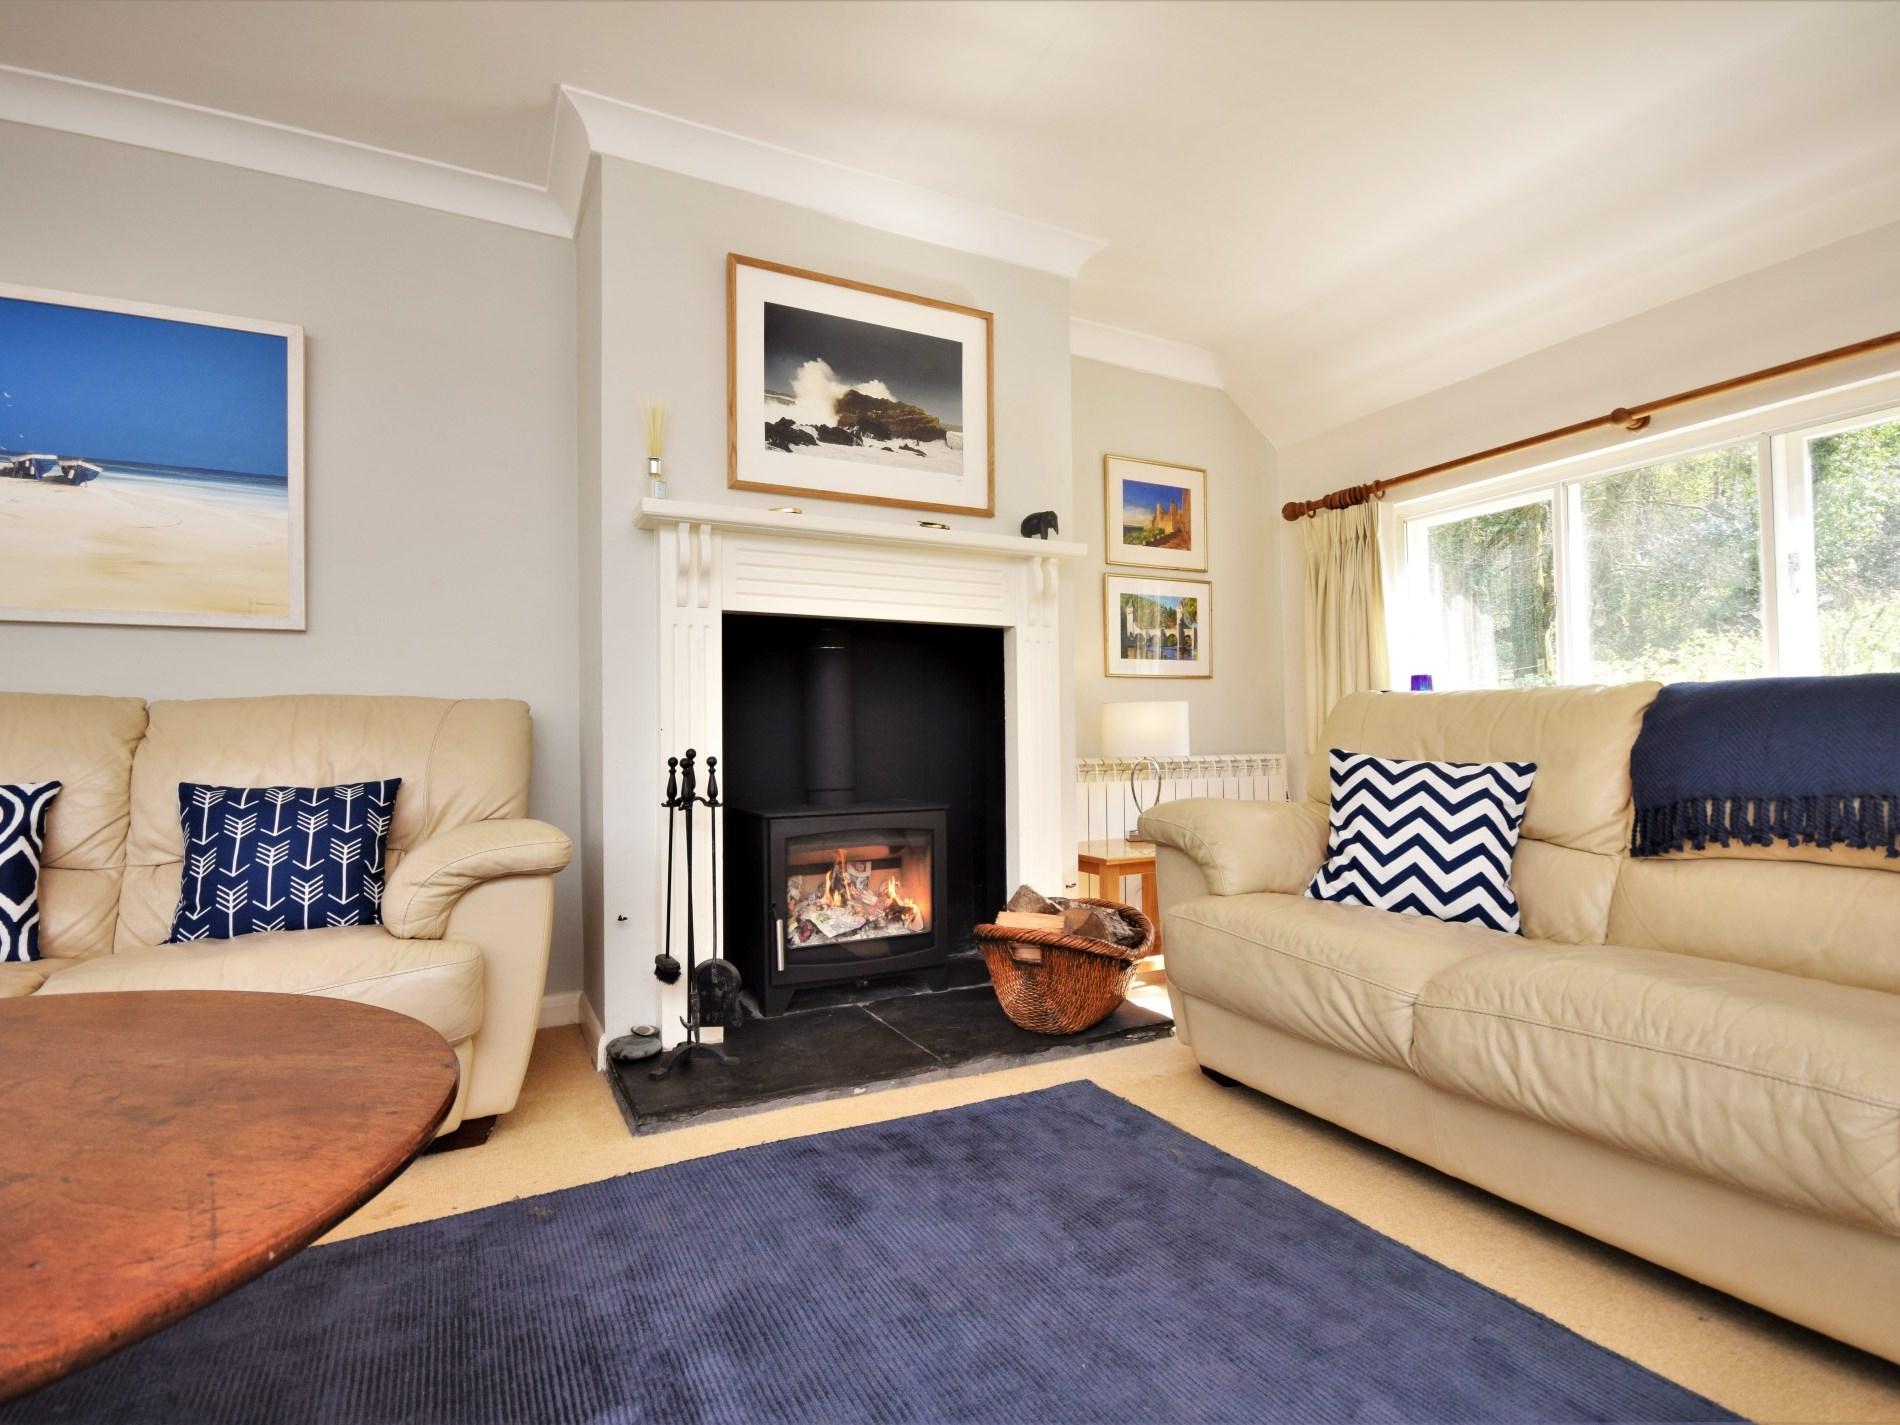 5 Bedroom House in North Devon, Devon